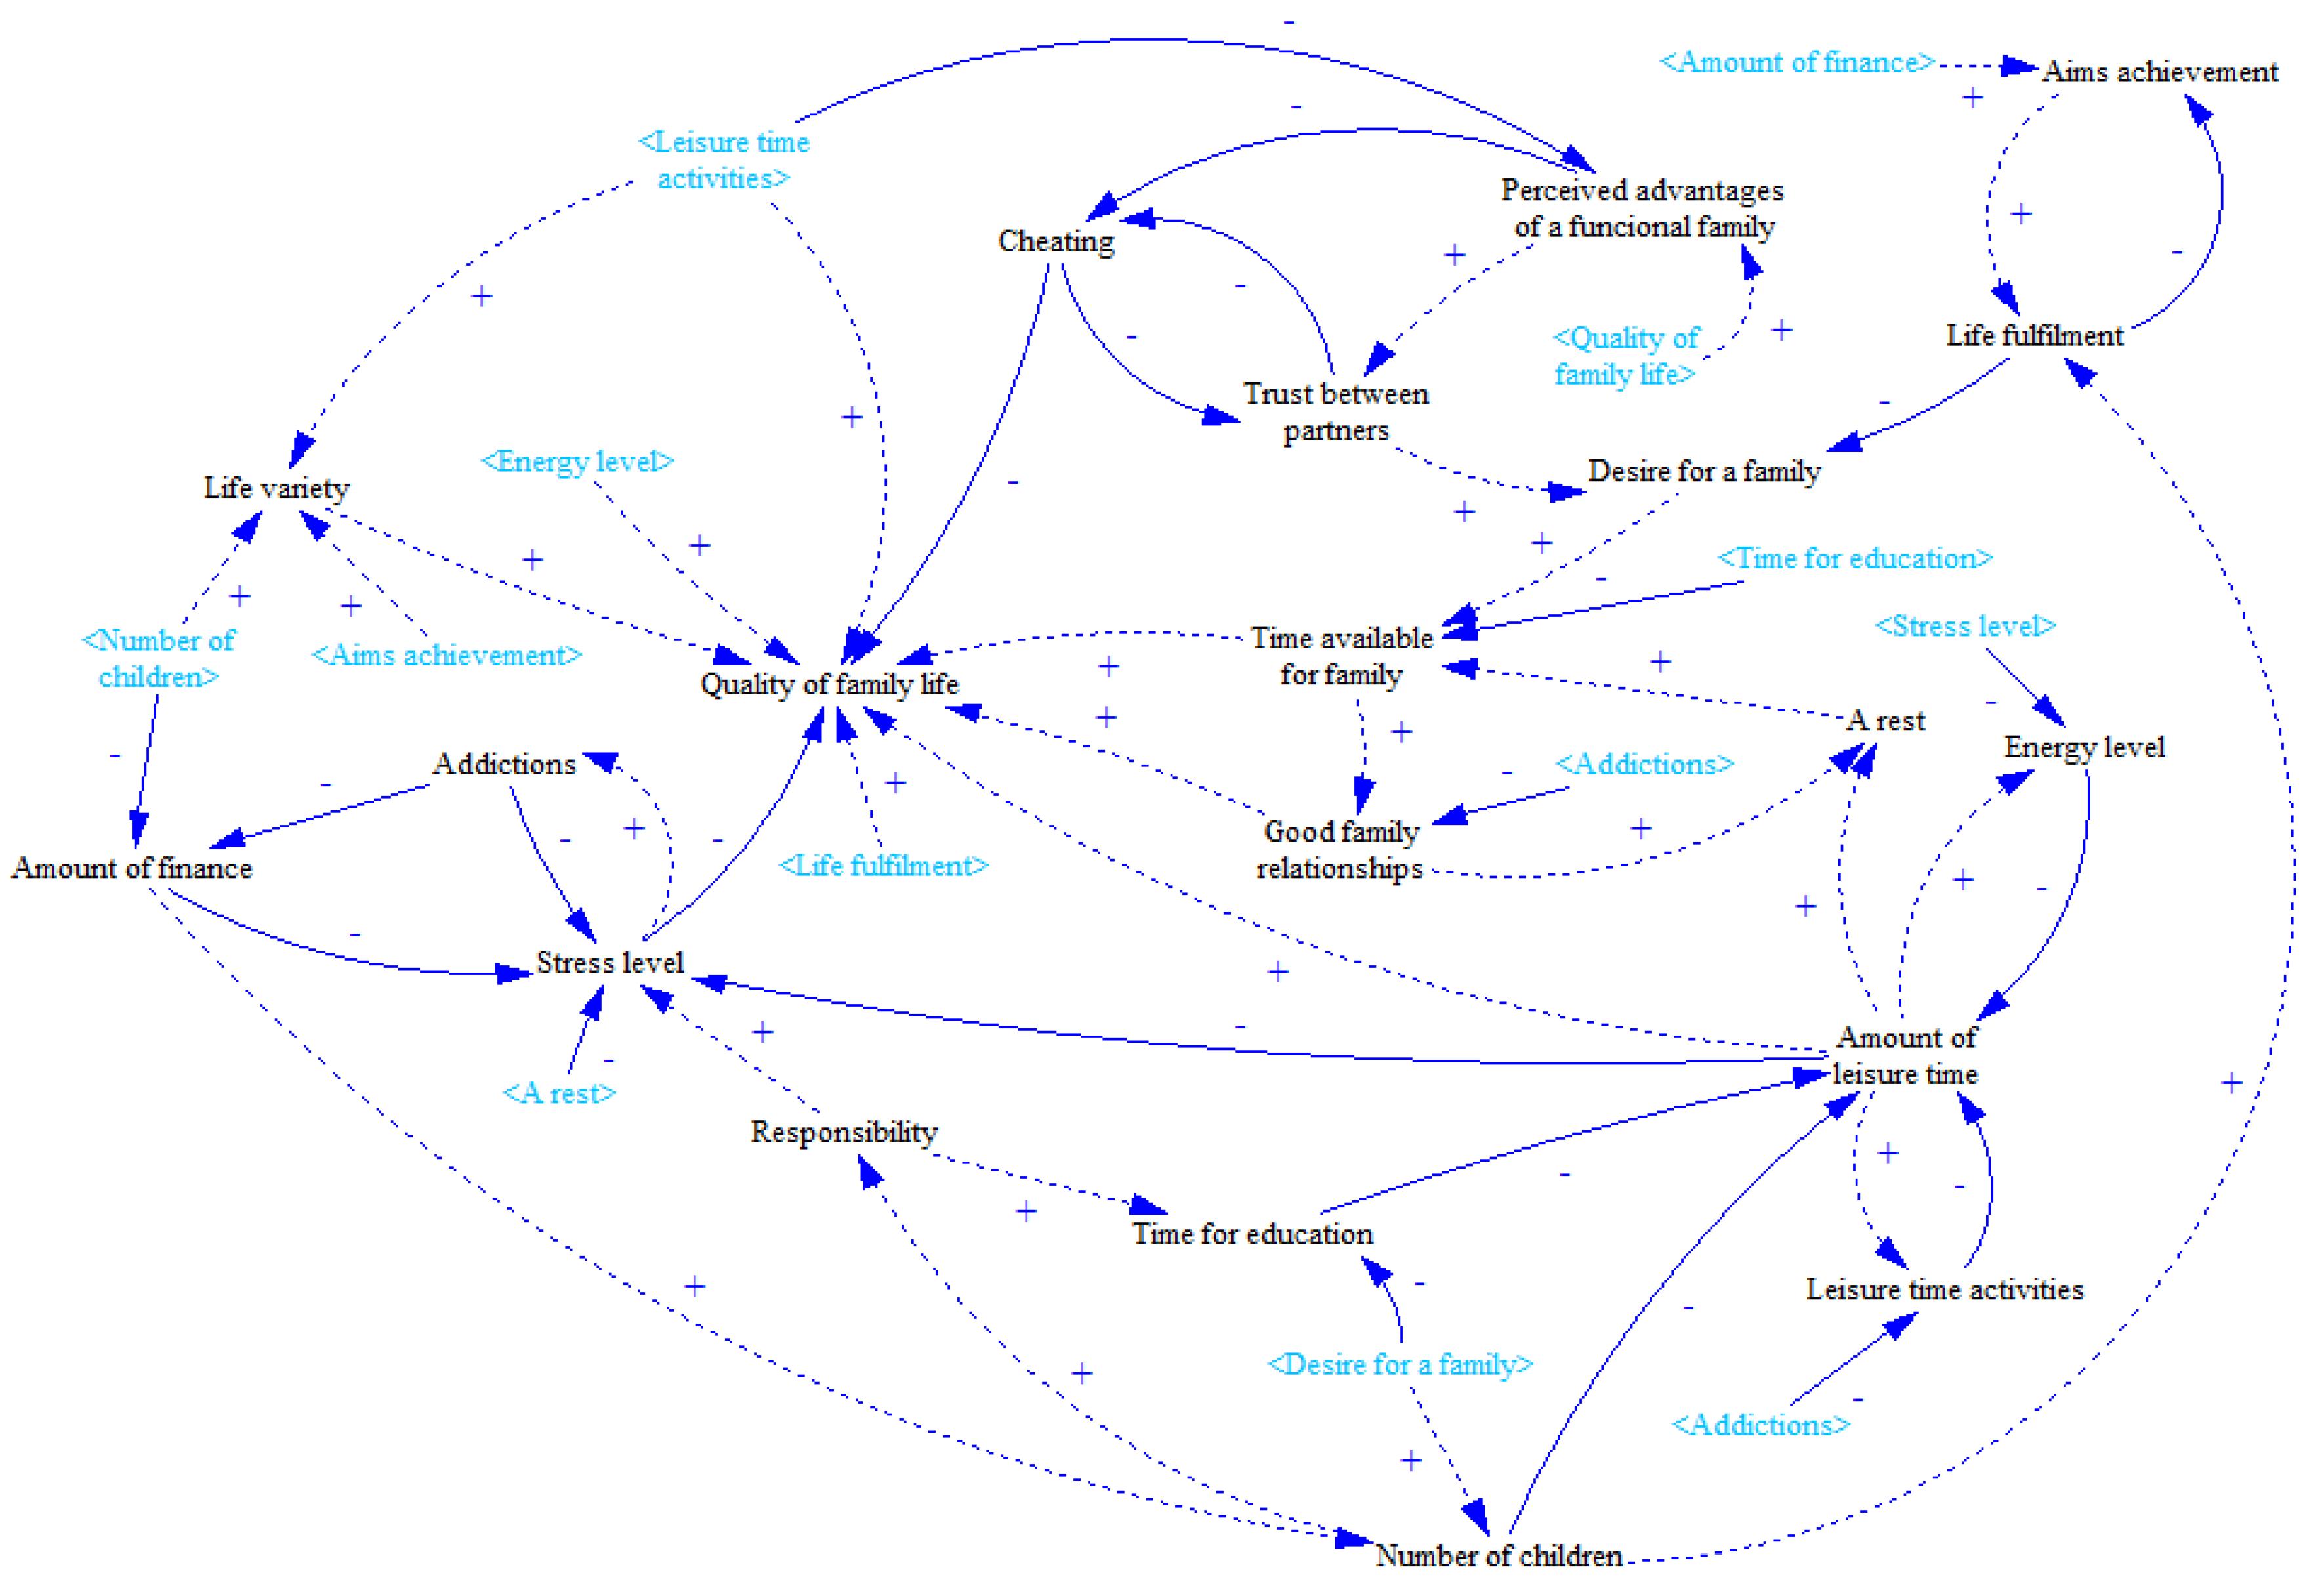 causal loop diagram systems 05 00046 g015 - Causal Loop Diagram Software Free Download